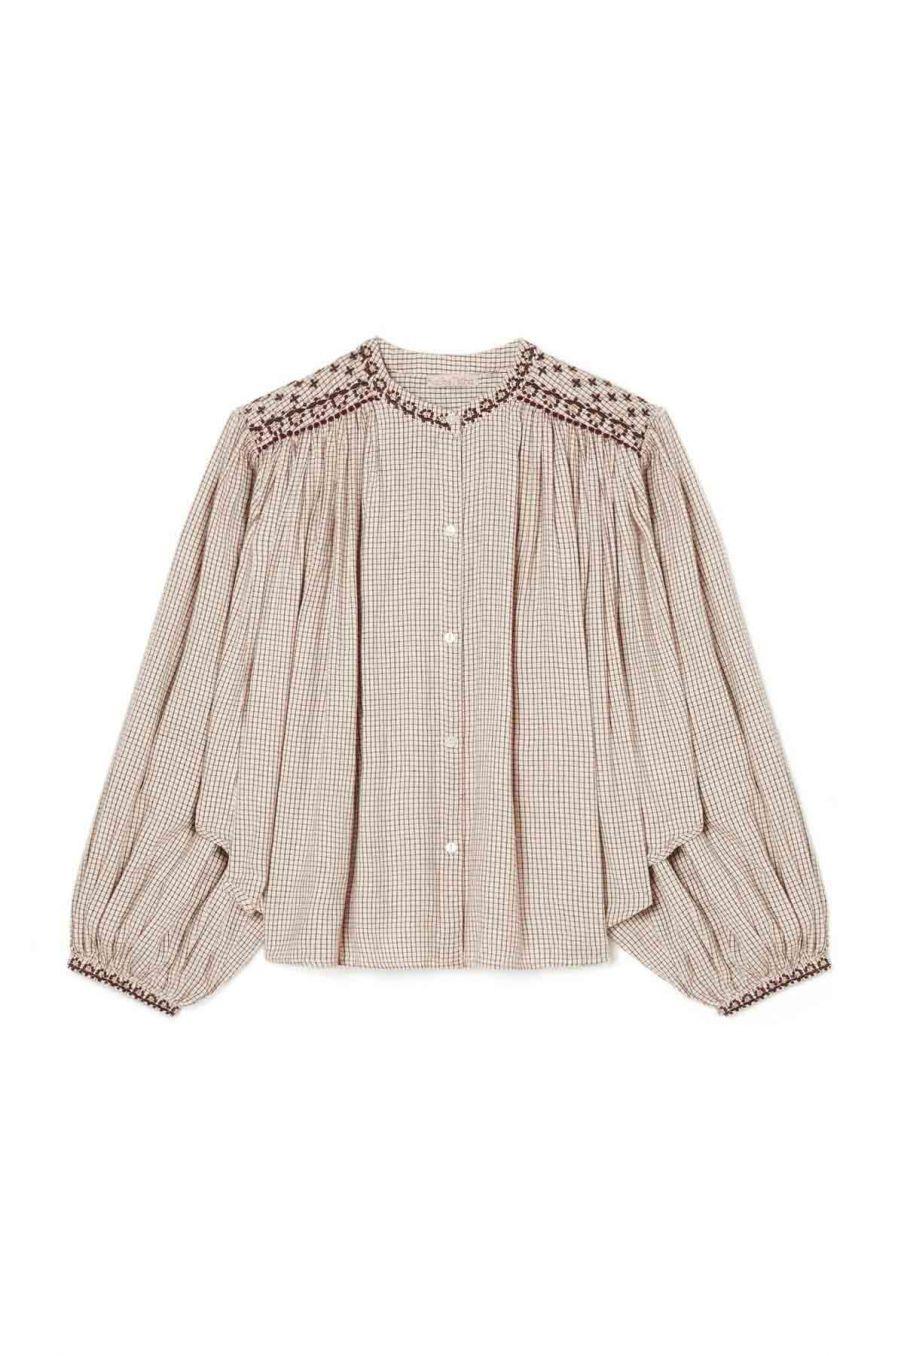 blouse femme jeanne cream check - louise misha